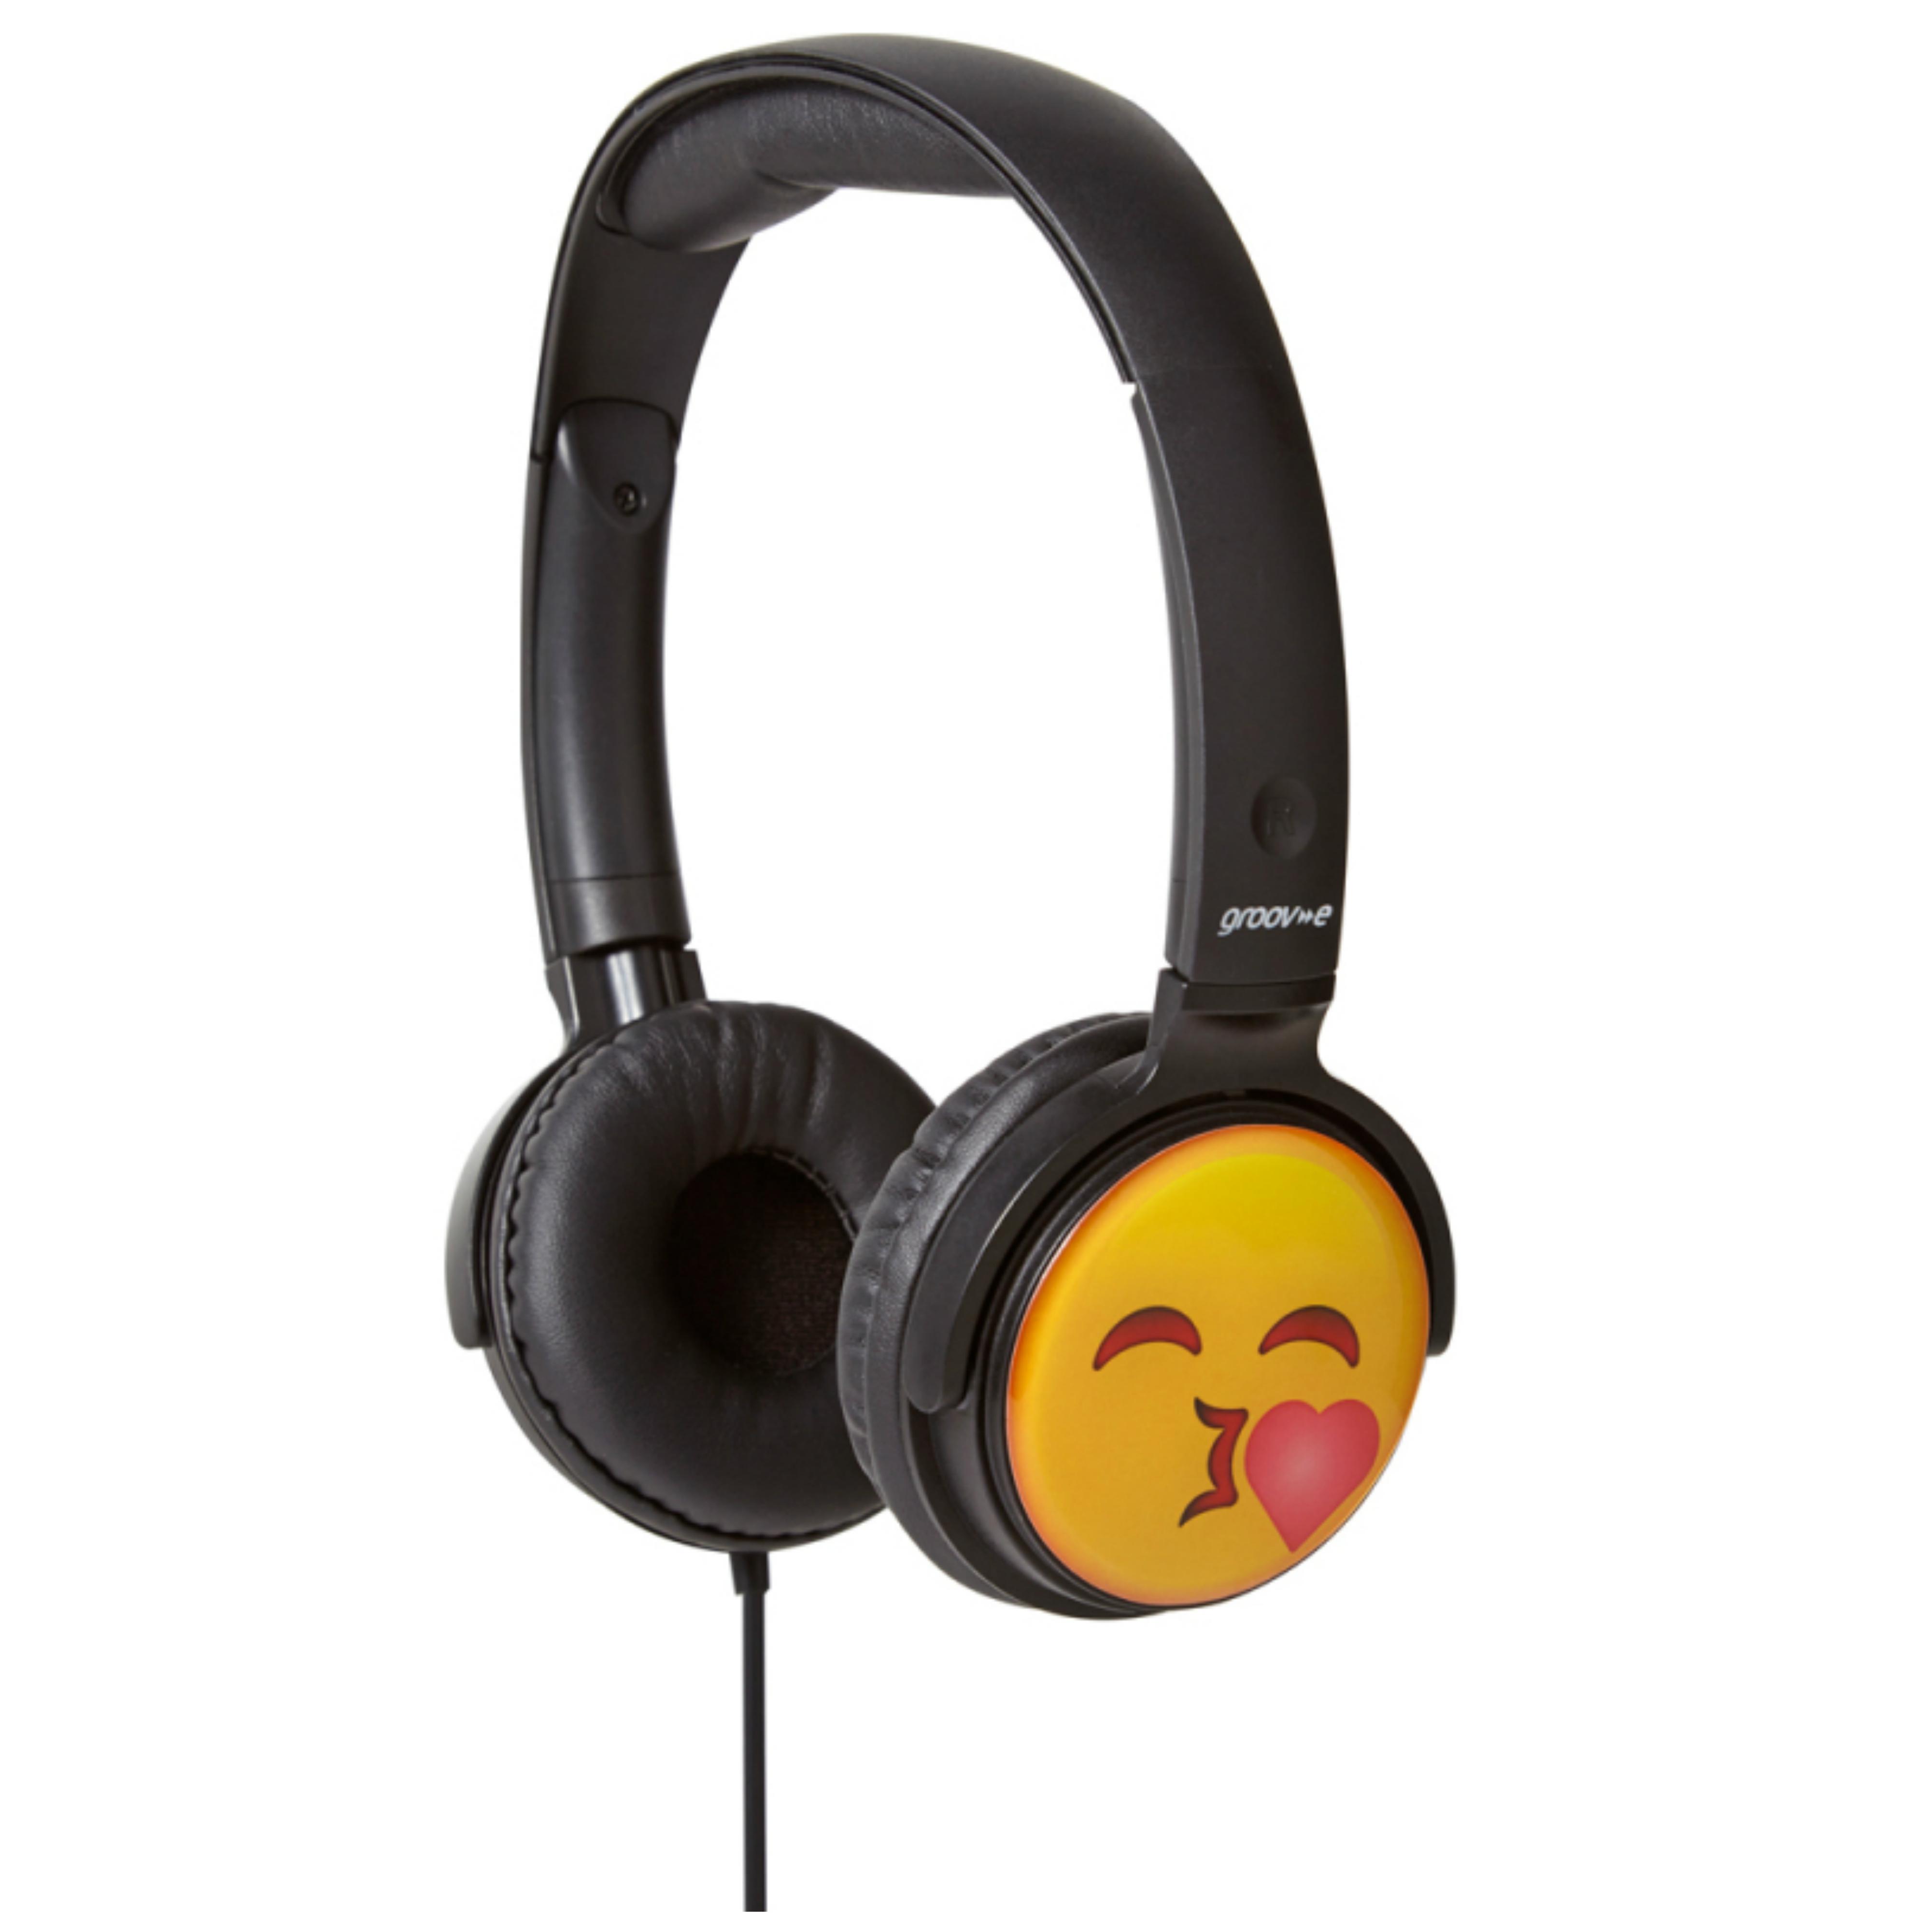 Groov-e GVEMJ14 EarMOJI's Stereo Headphone With Swivel Ear Cups & Kissing Face